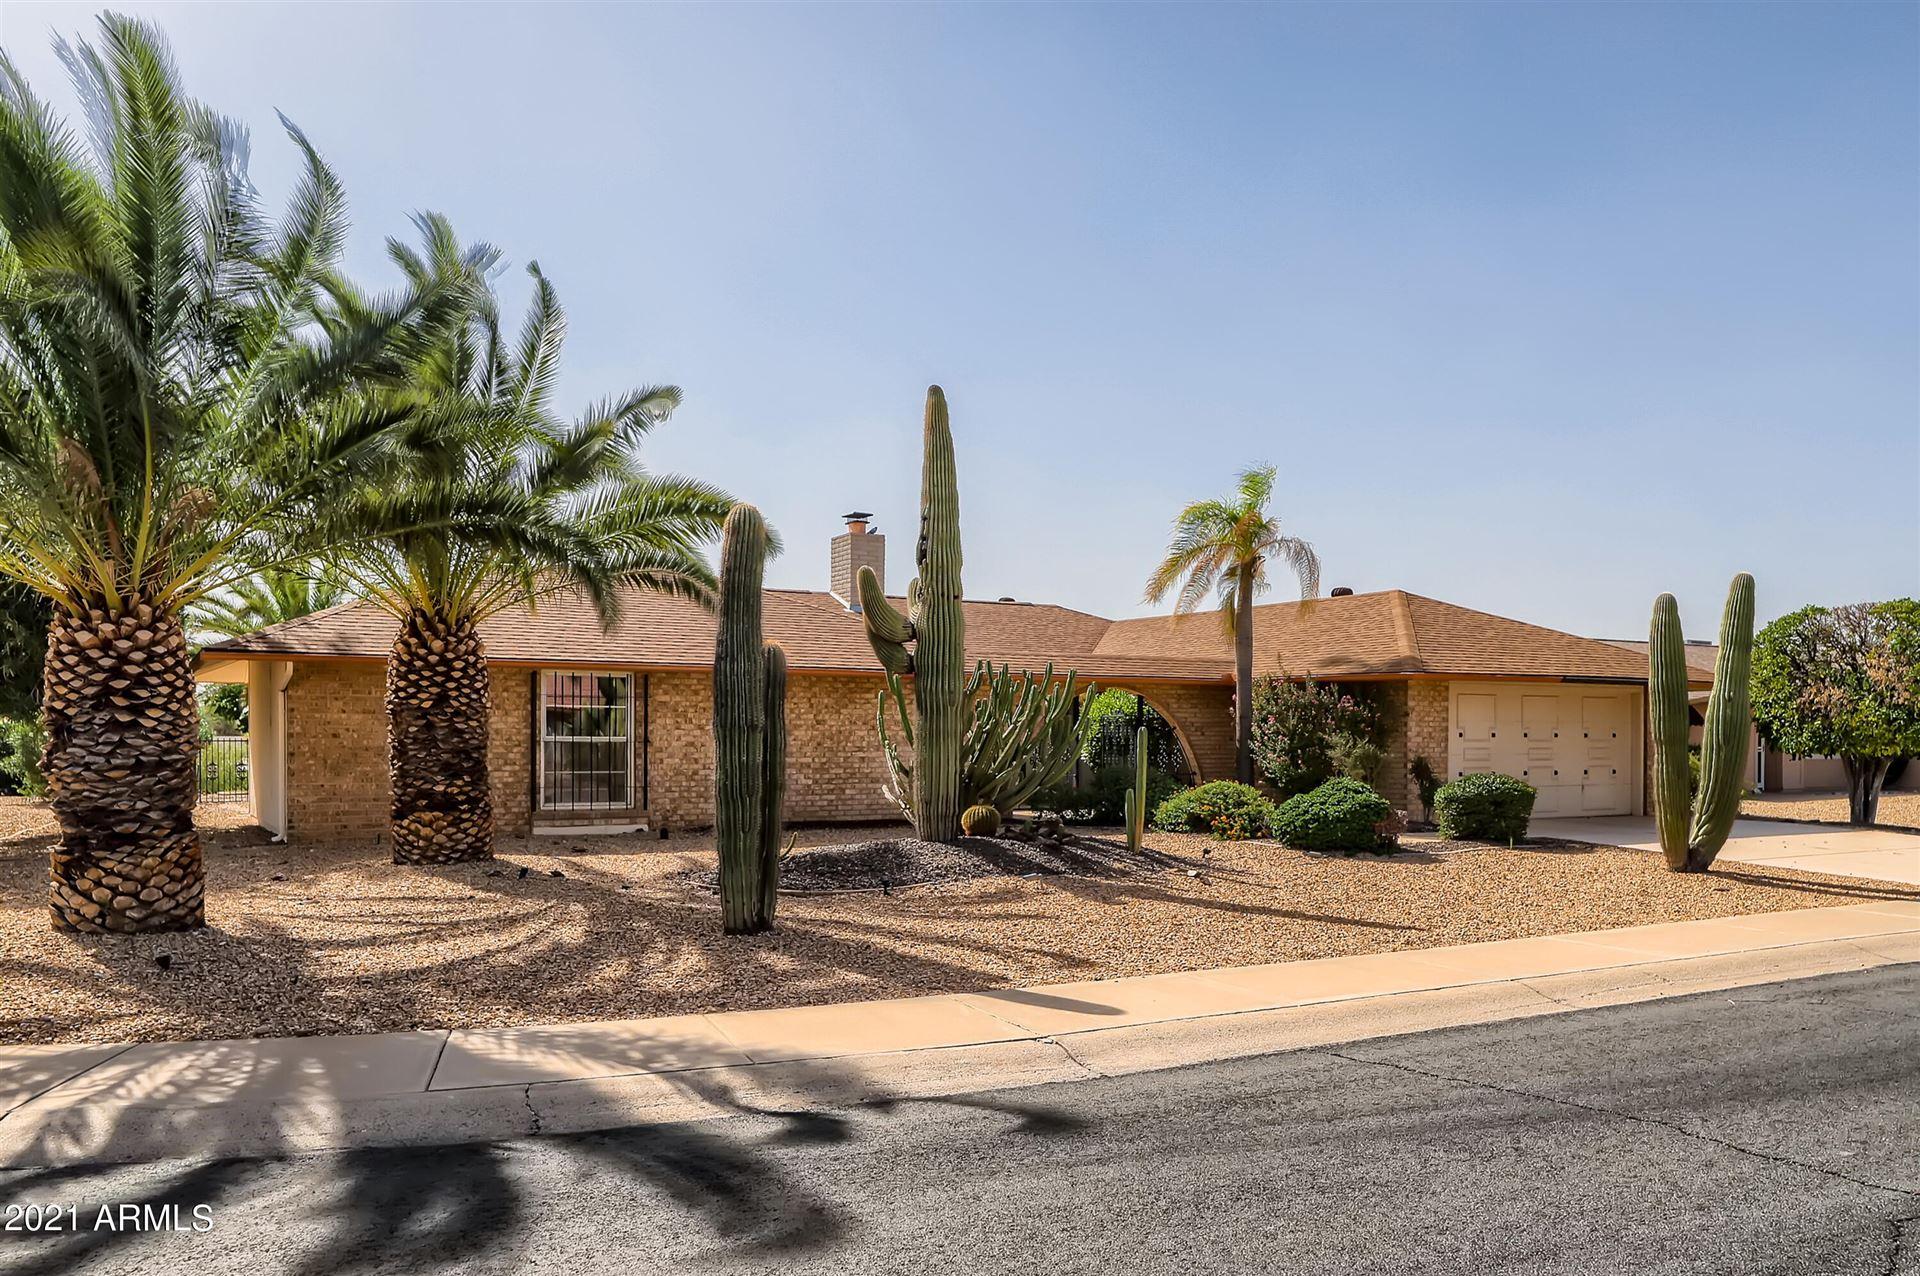 Photo of 12311 W JADESTONE Drive, Sun City West, AZ 85375 (MLS # 6306766)